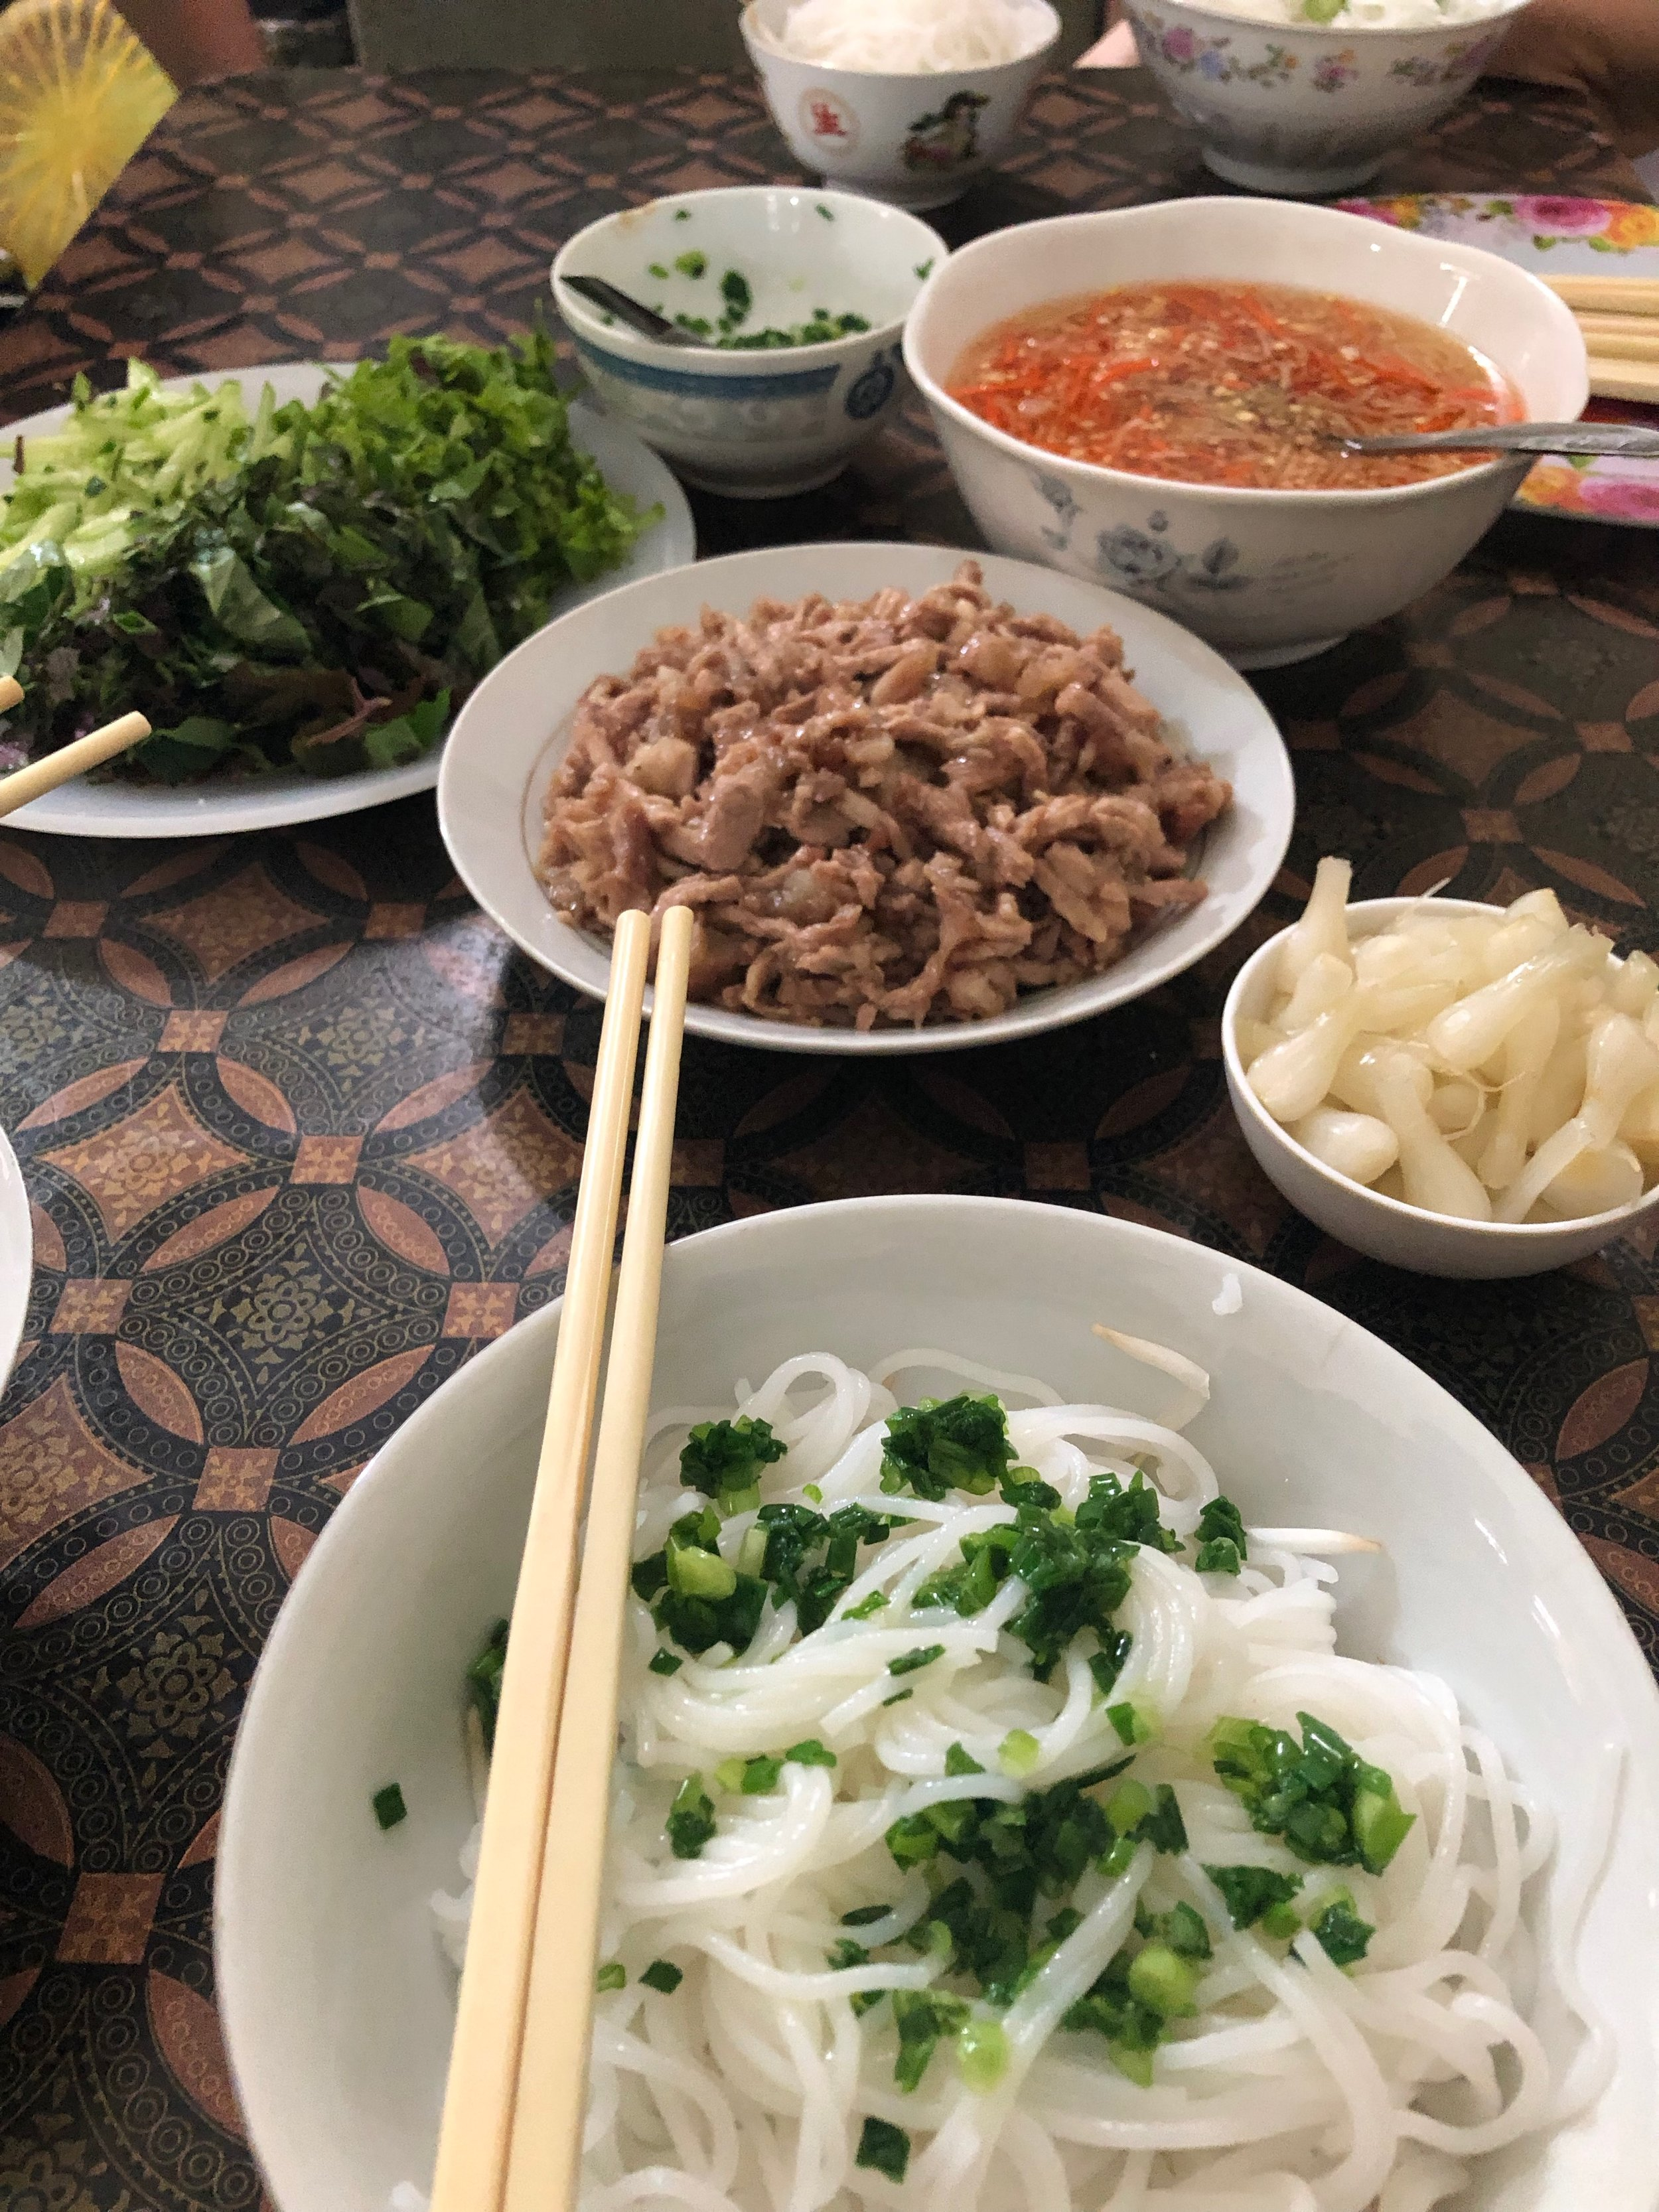 Bun ram - Caramelized pork with noodles